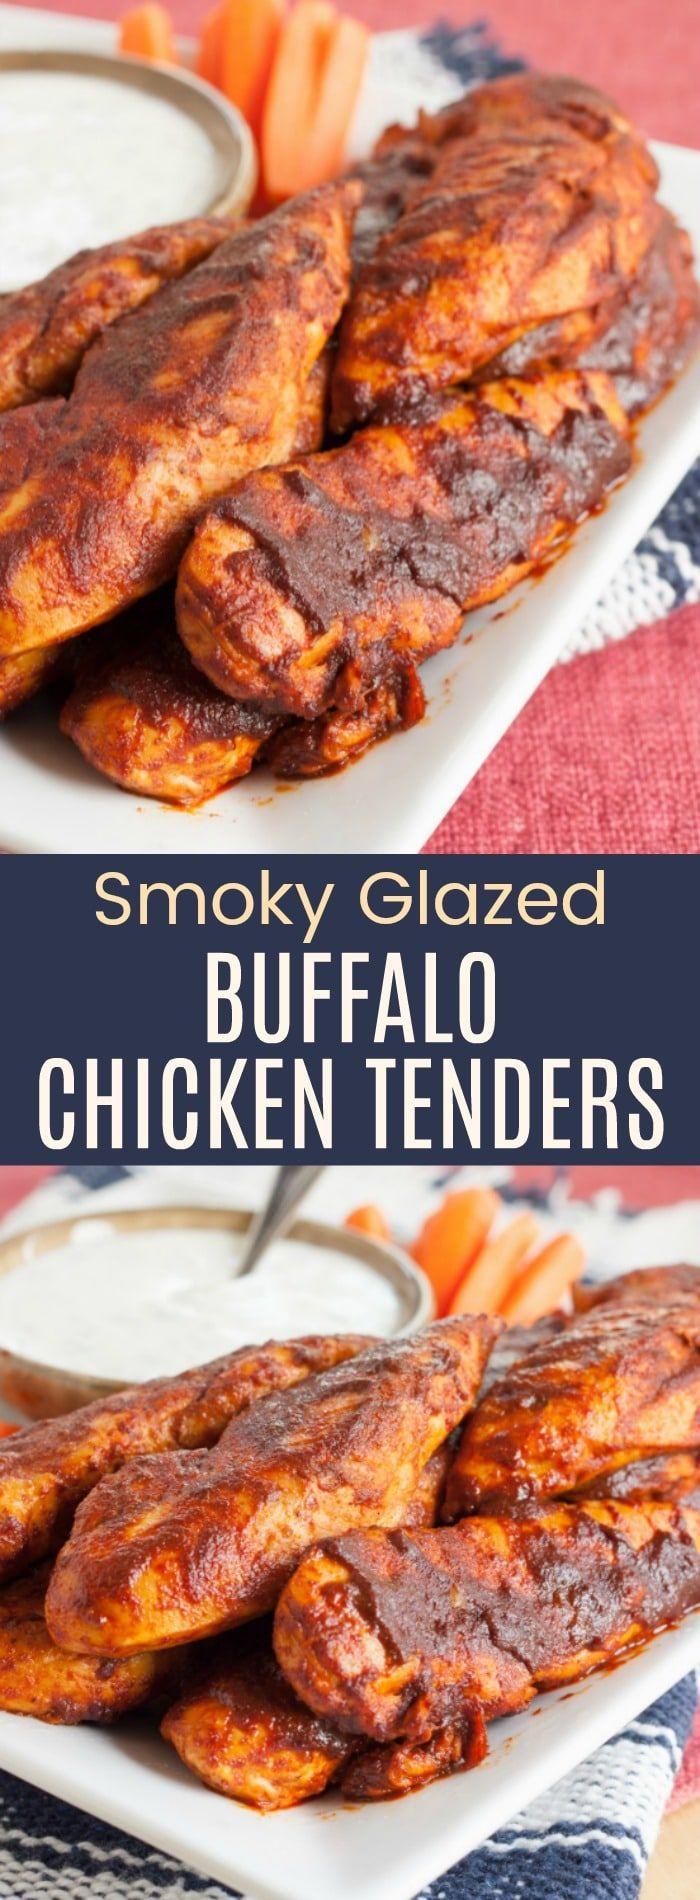 Smoky Glazed Buffalo Chicken Tenders + recipe